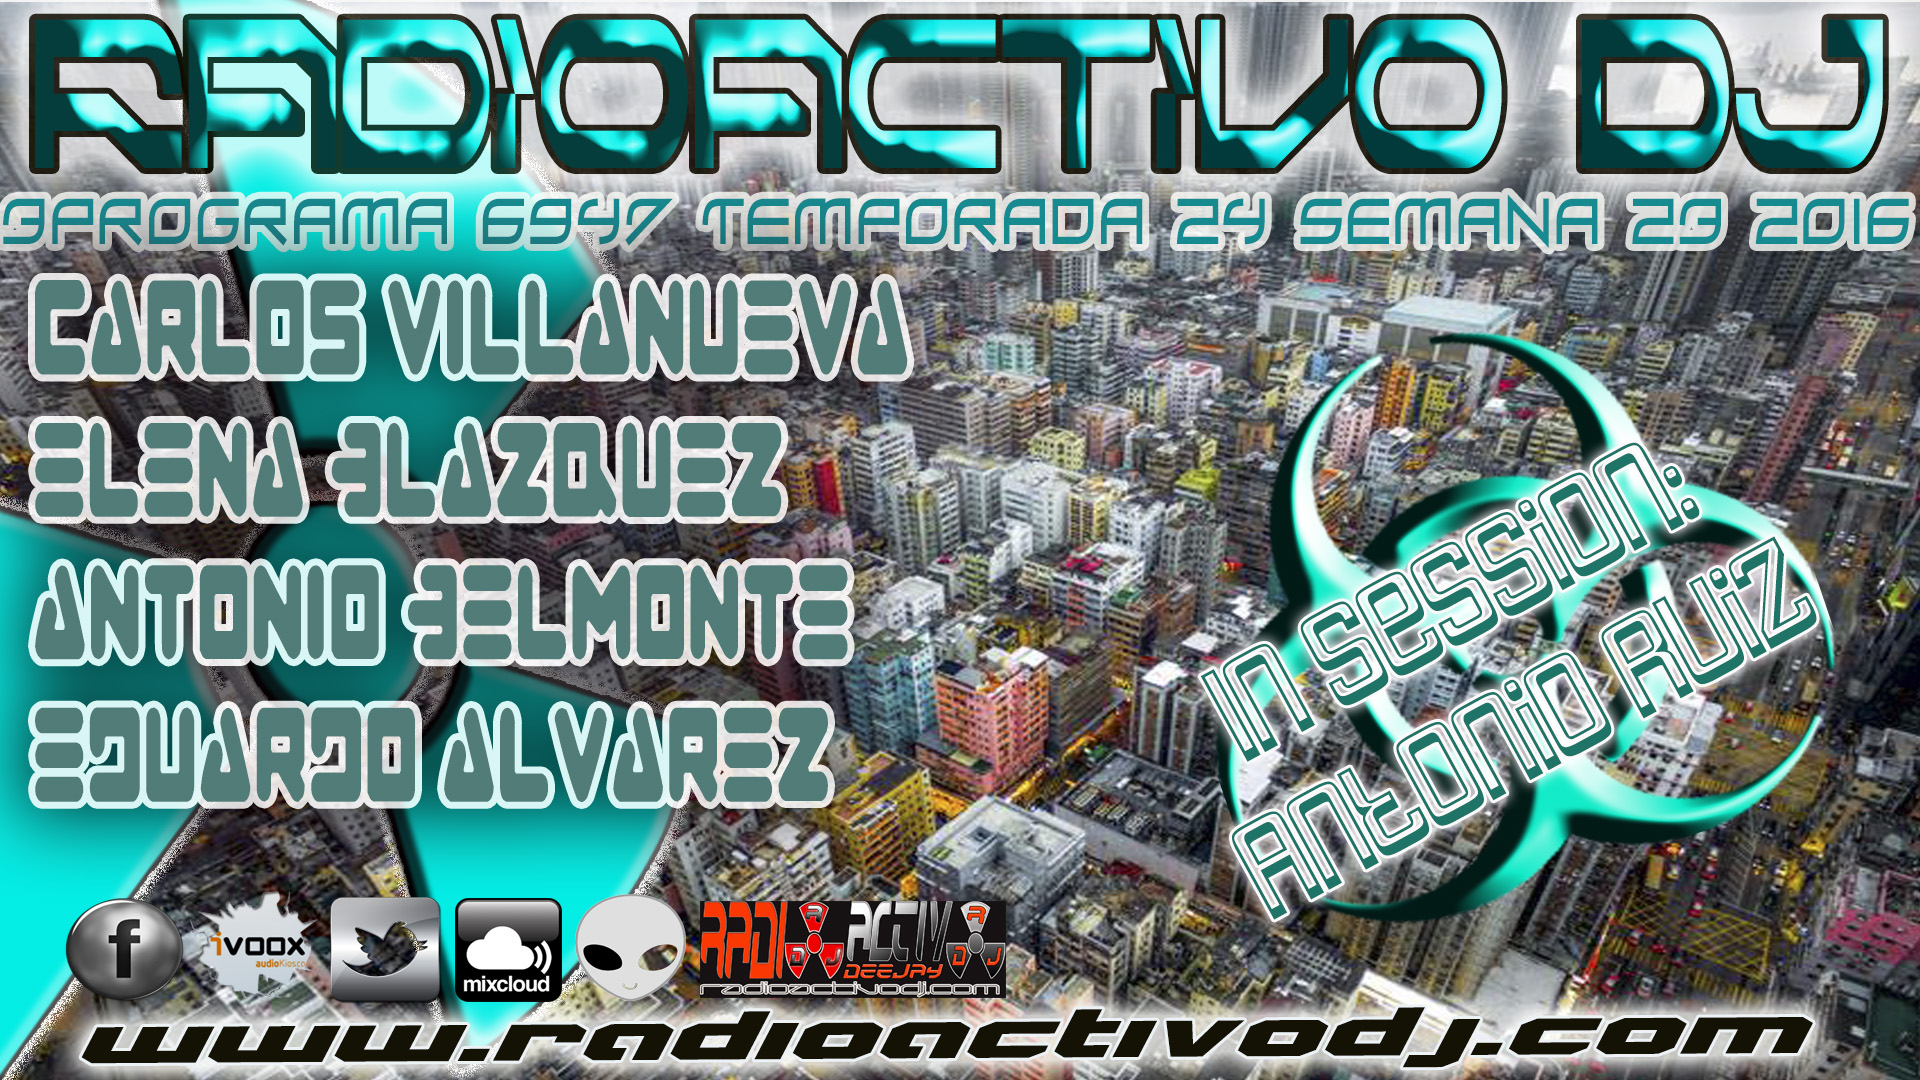 RADIOACTIVO-DJ-23-2016